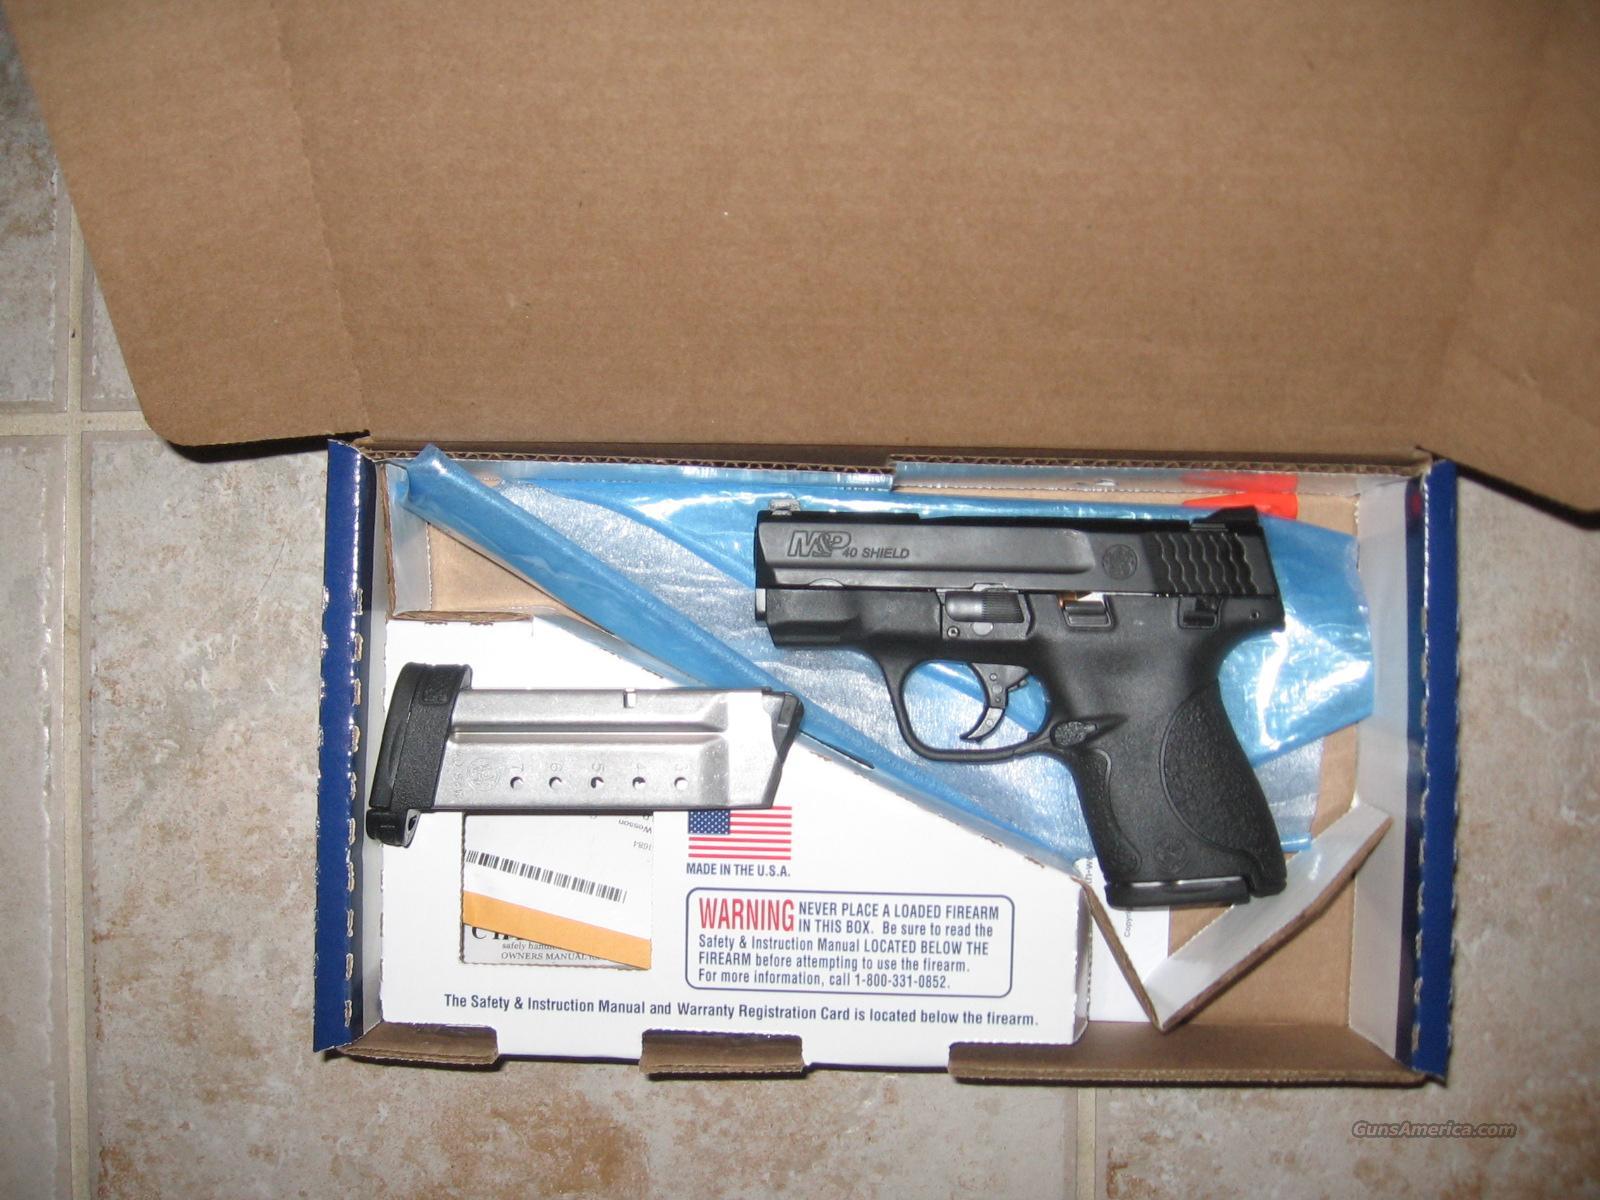 S&W M&P Shield  Guns > Pistols > Smith & Wesson Pistols - Autos > Shield